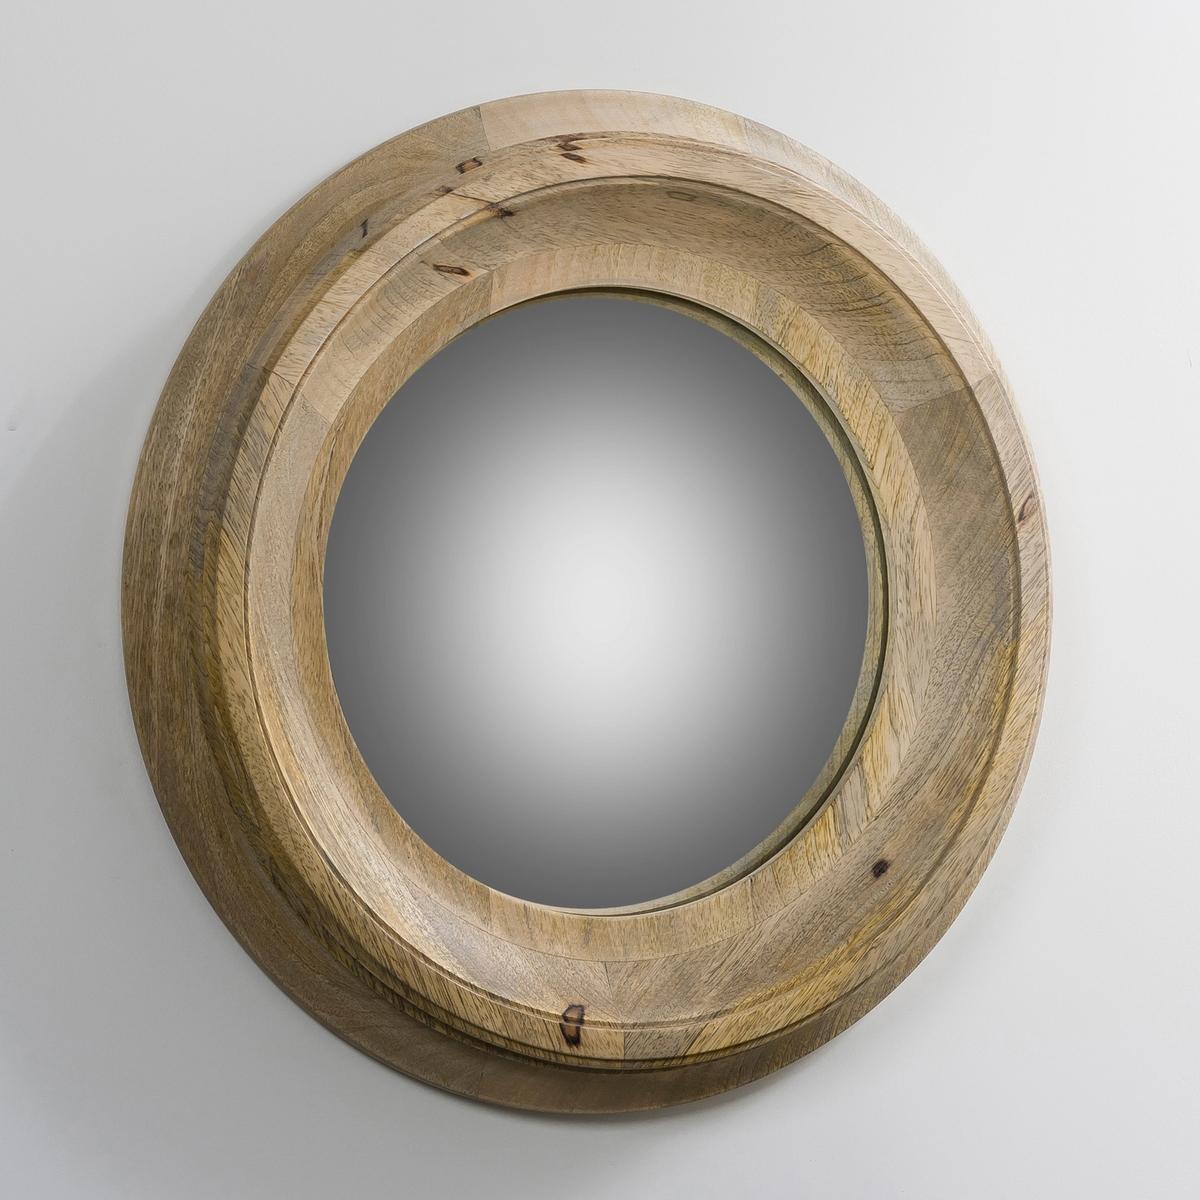 Зеркало волшебное  Ø40 см, Habel